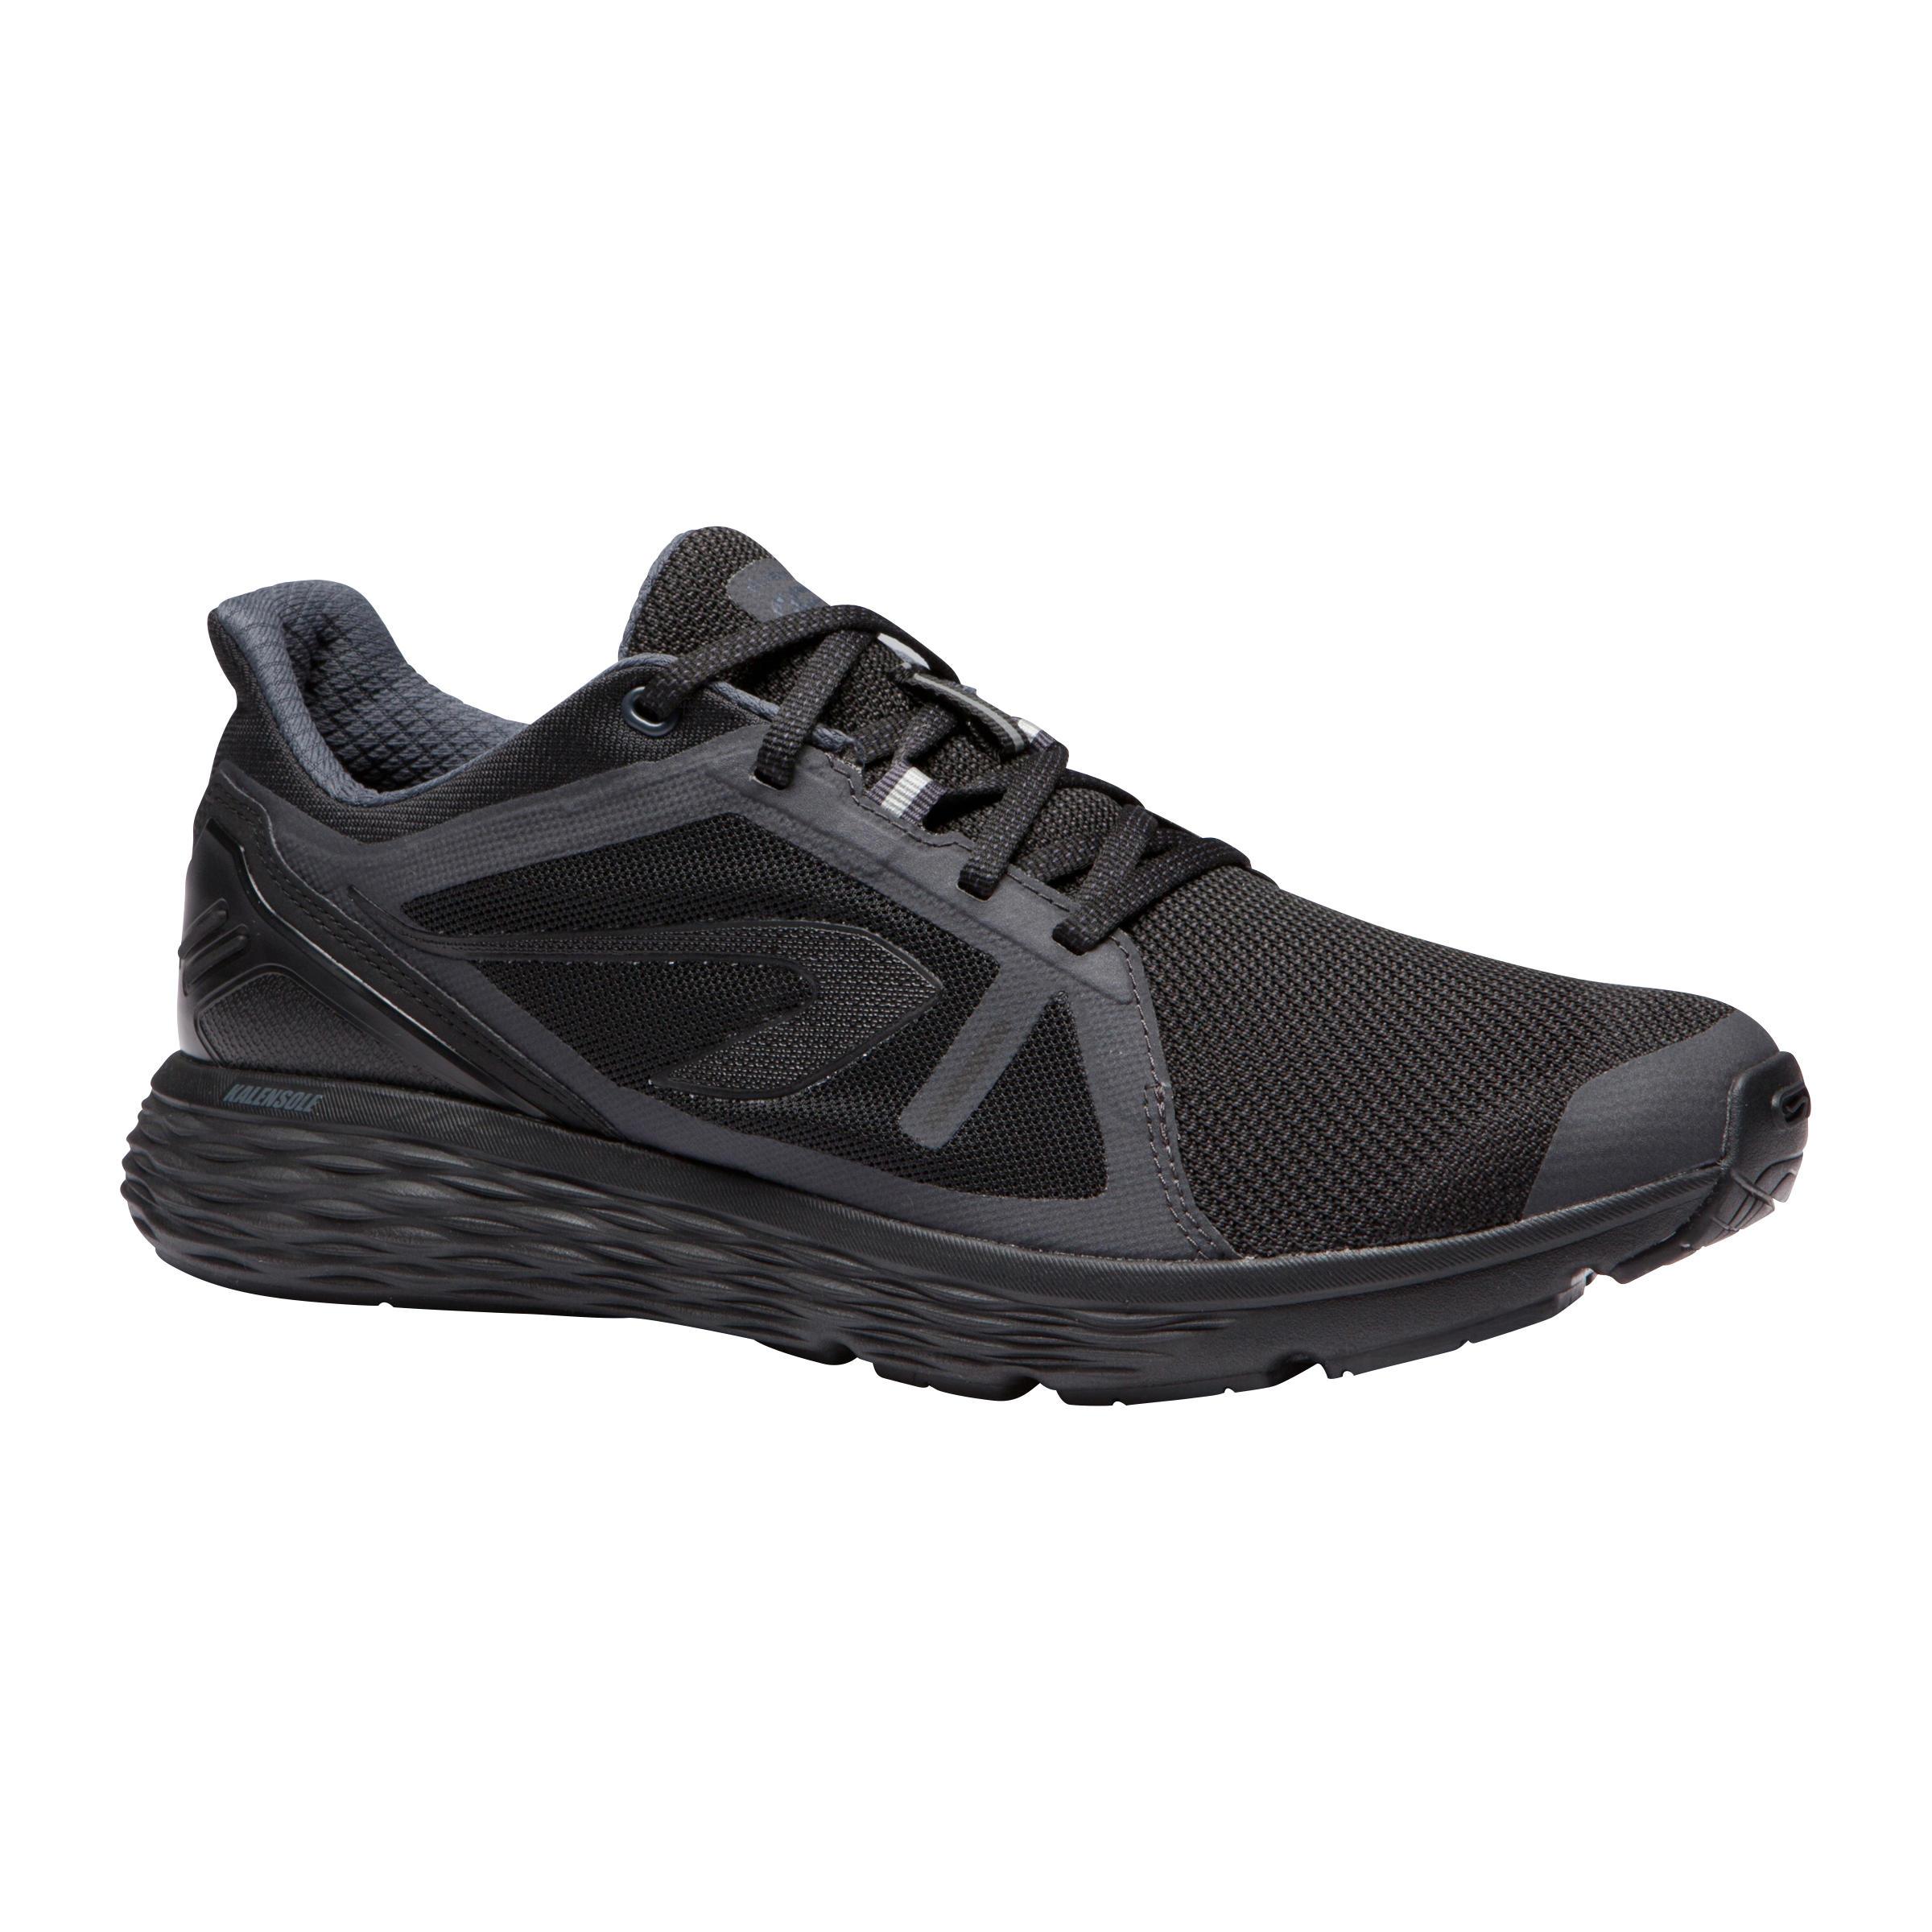 Kalenji Joggingschoenen Run Comfort heren zwart